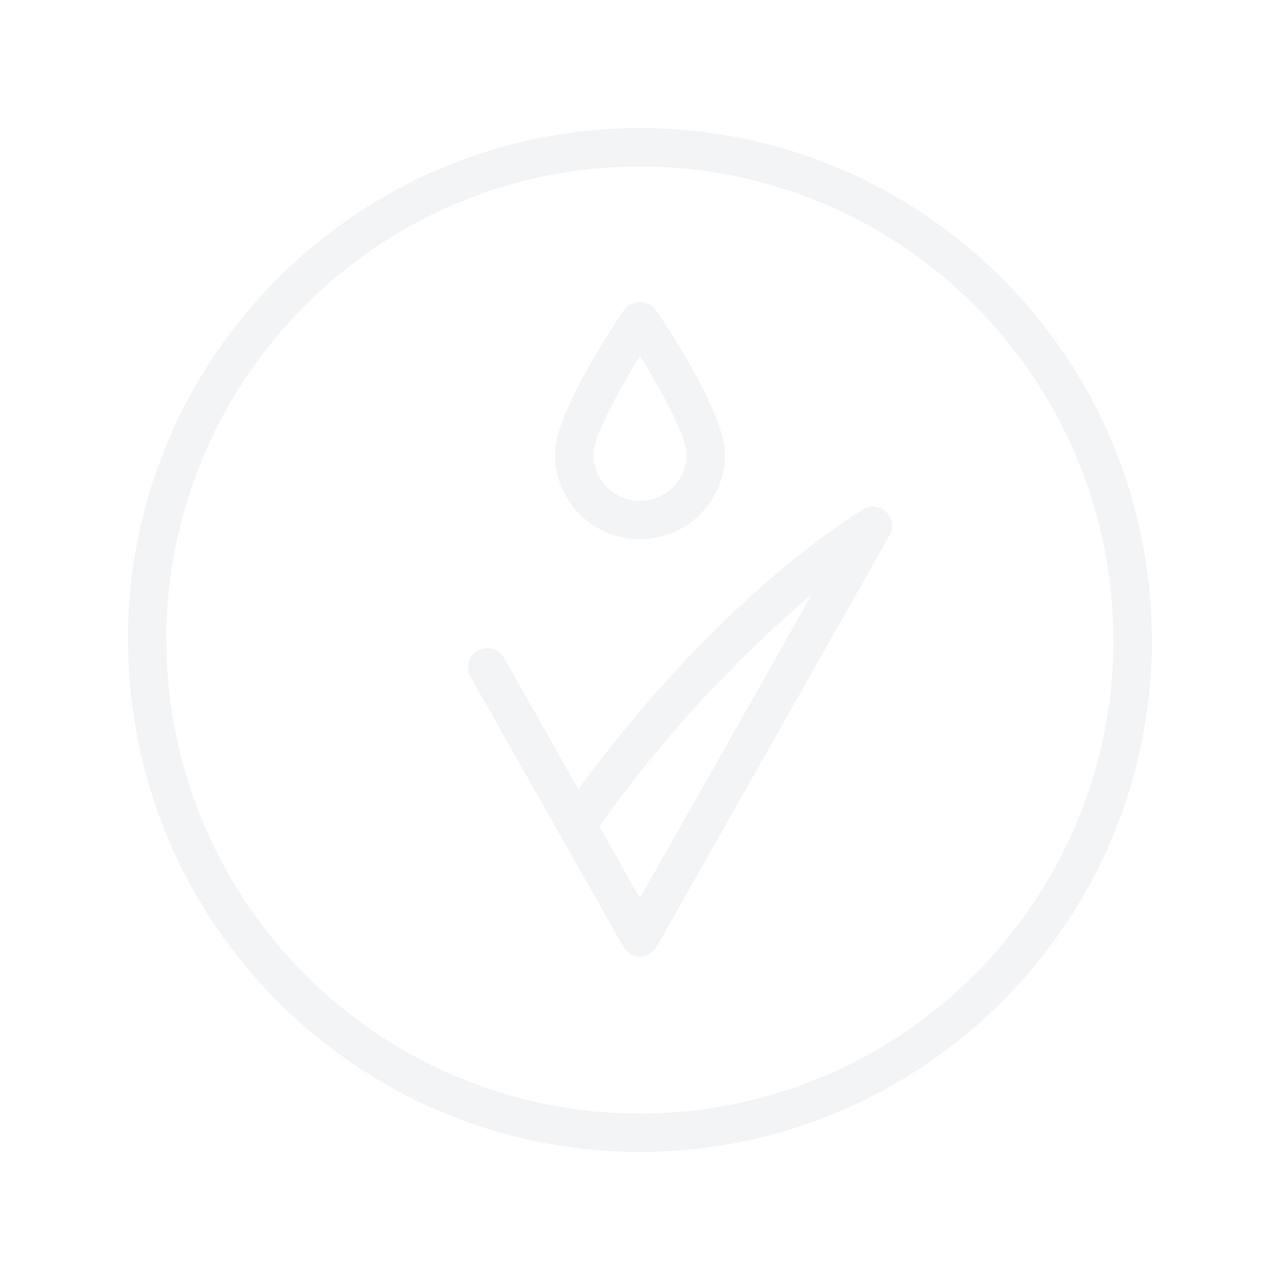 MAYBELLINE Face Studio Setting Powder 9g